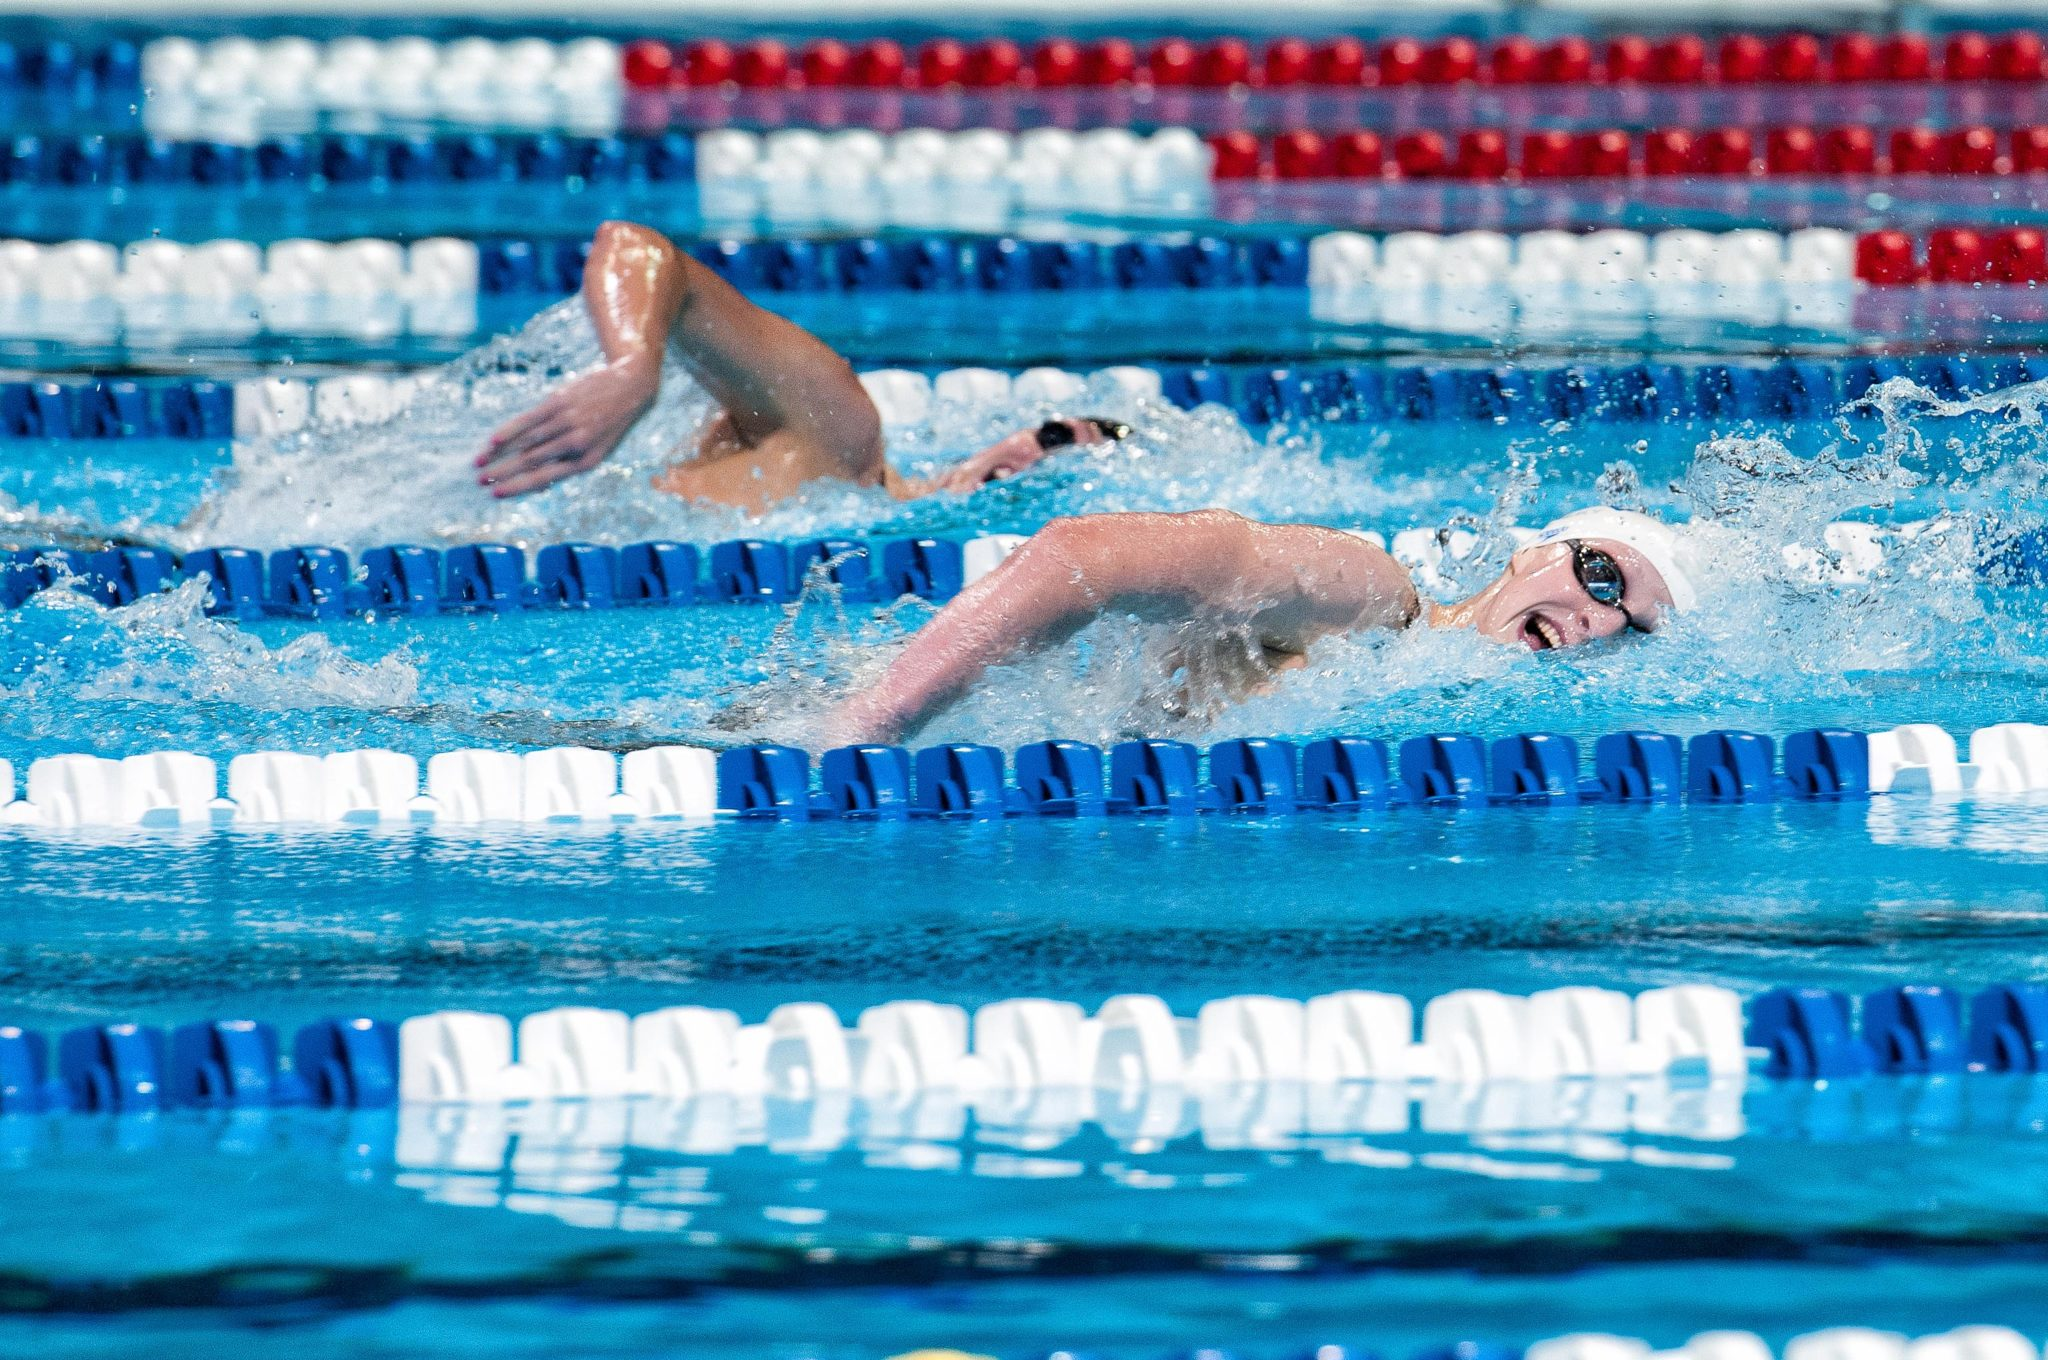 cactus classic swim meet 2016 ncaa